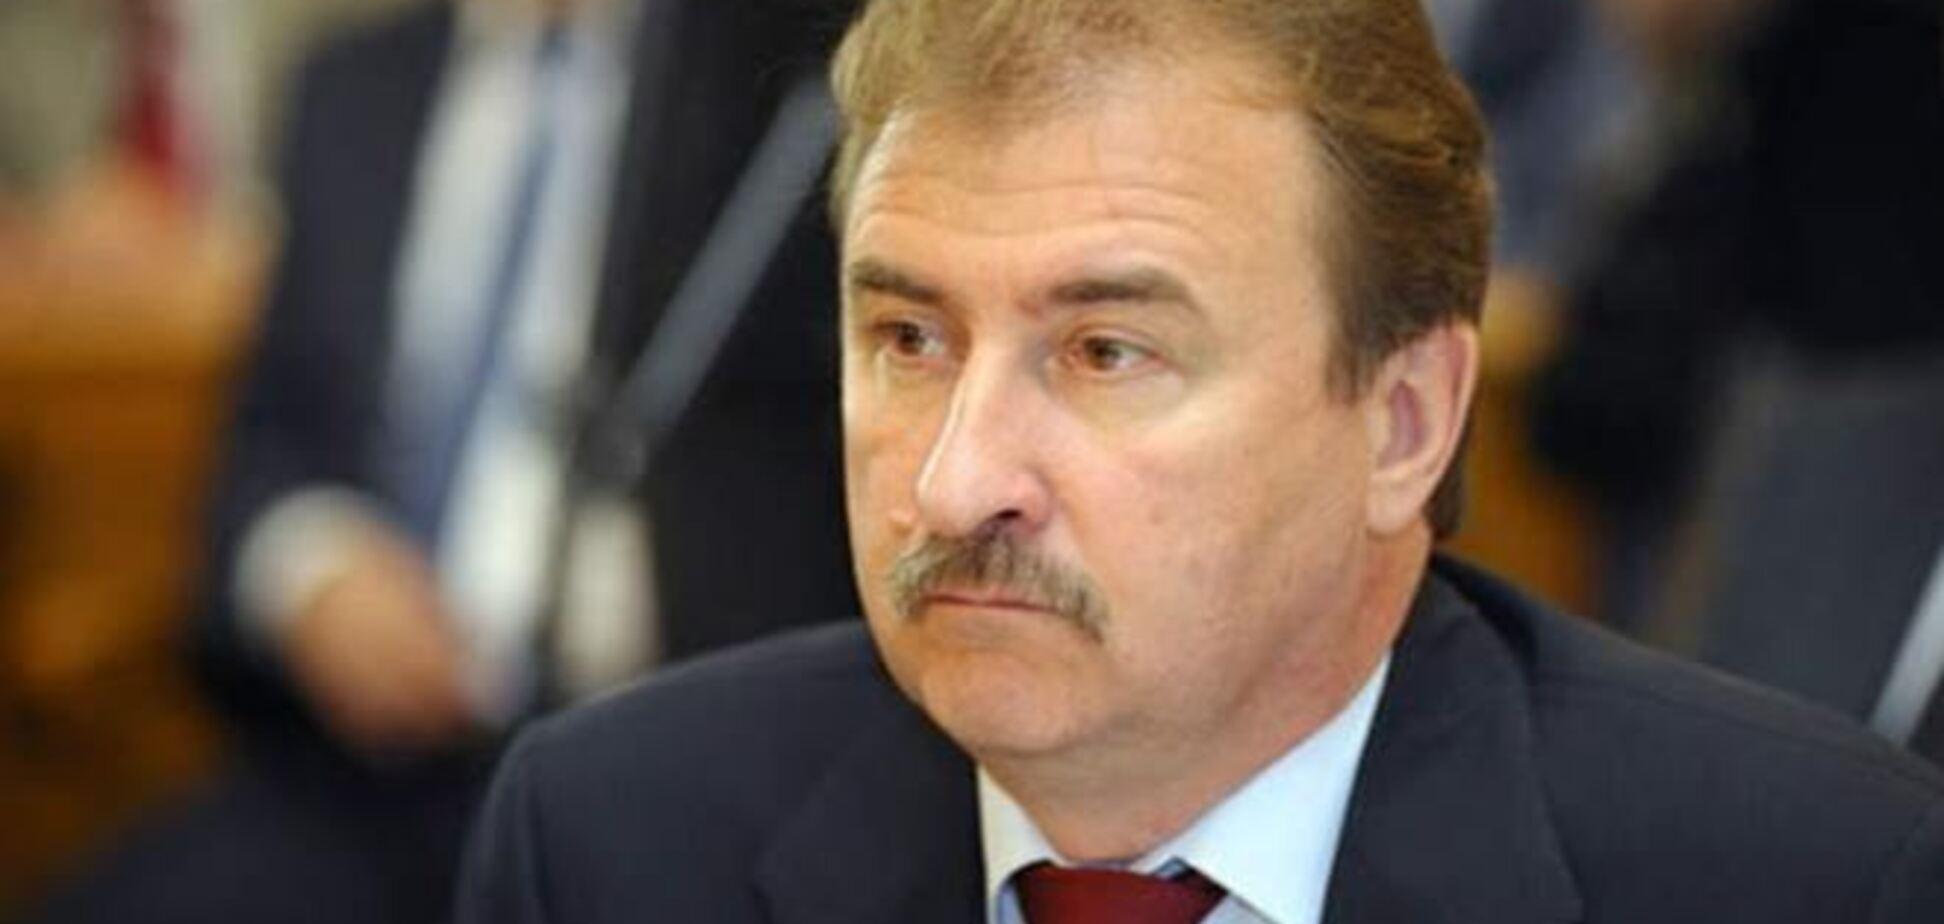 Экс-главу КГГА Попова обвиняют в пособничестве в разгоне Майдана - ГПУ